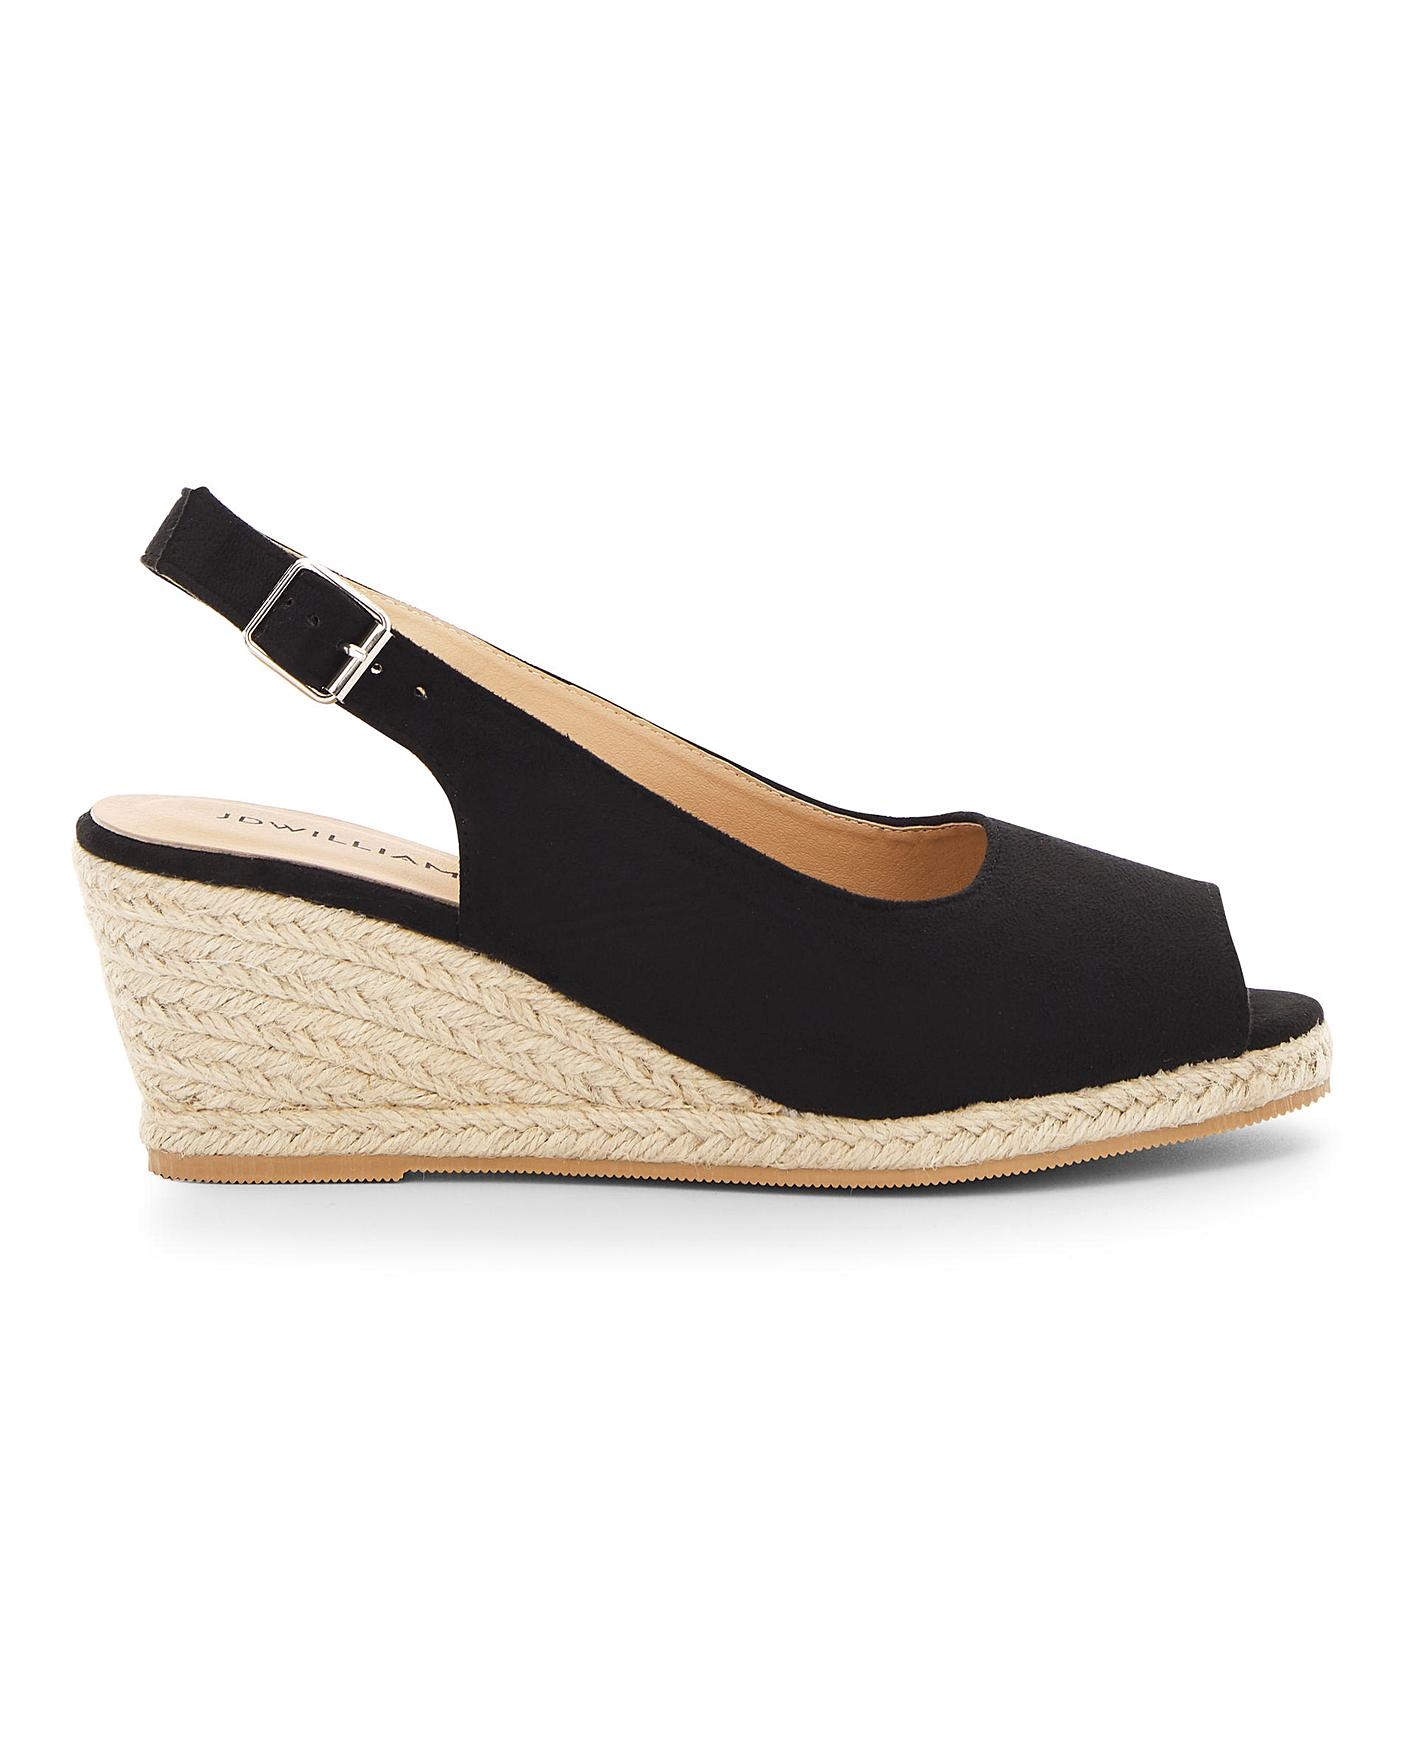 Peep Toe Espadrille Wedge Sandals E Fit